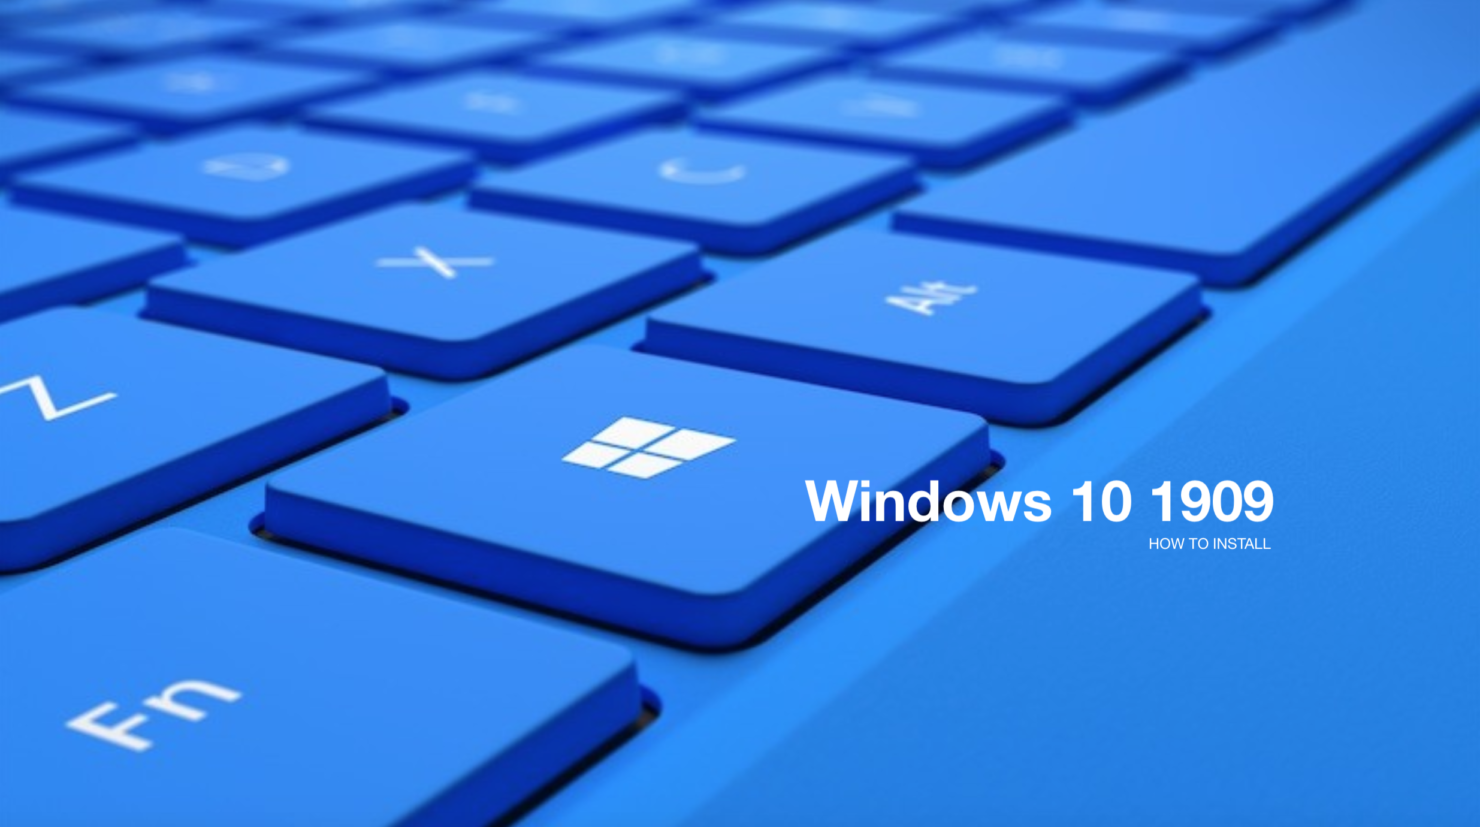 install windows 10 1909